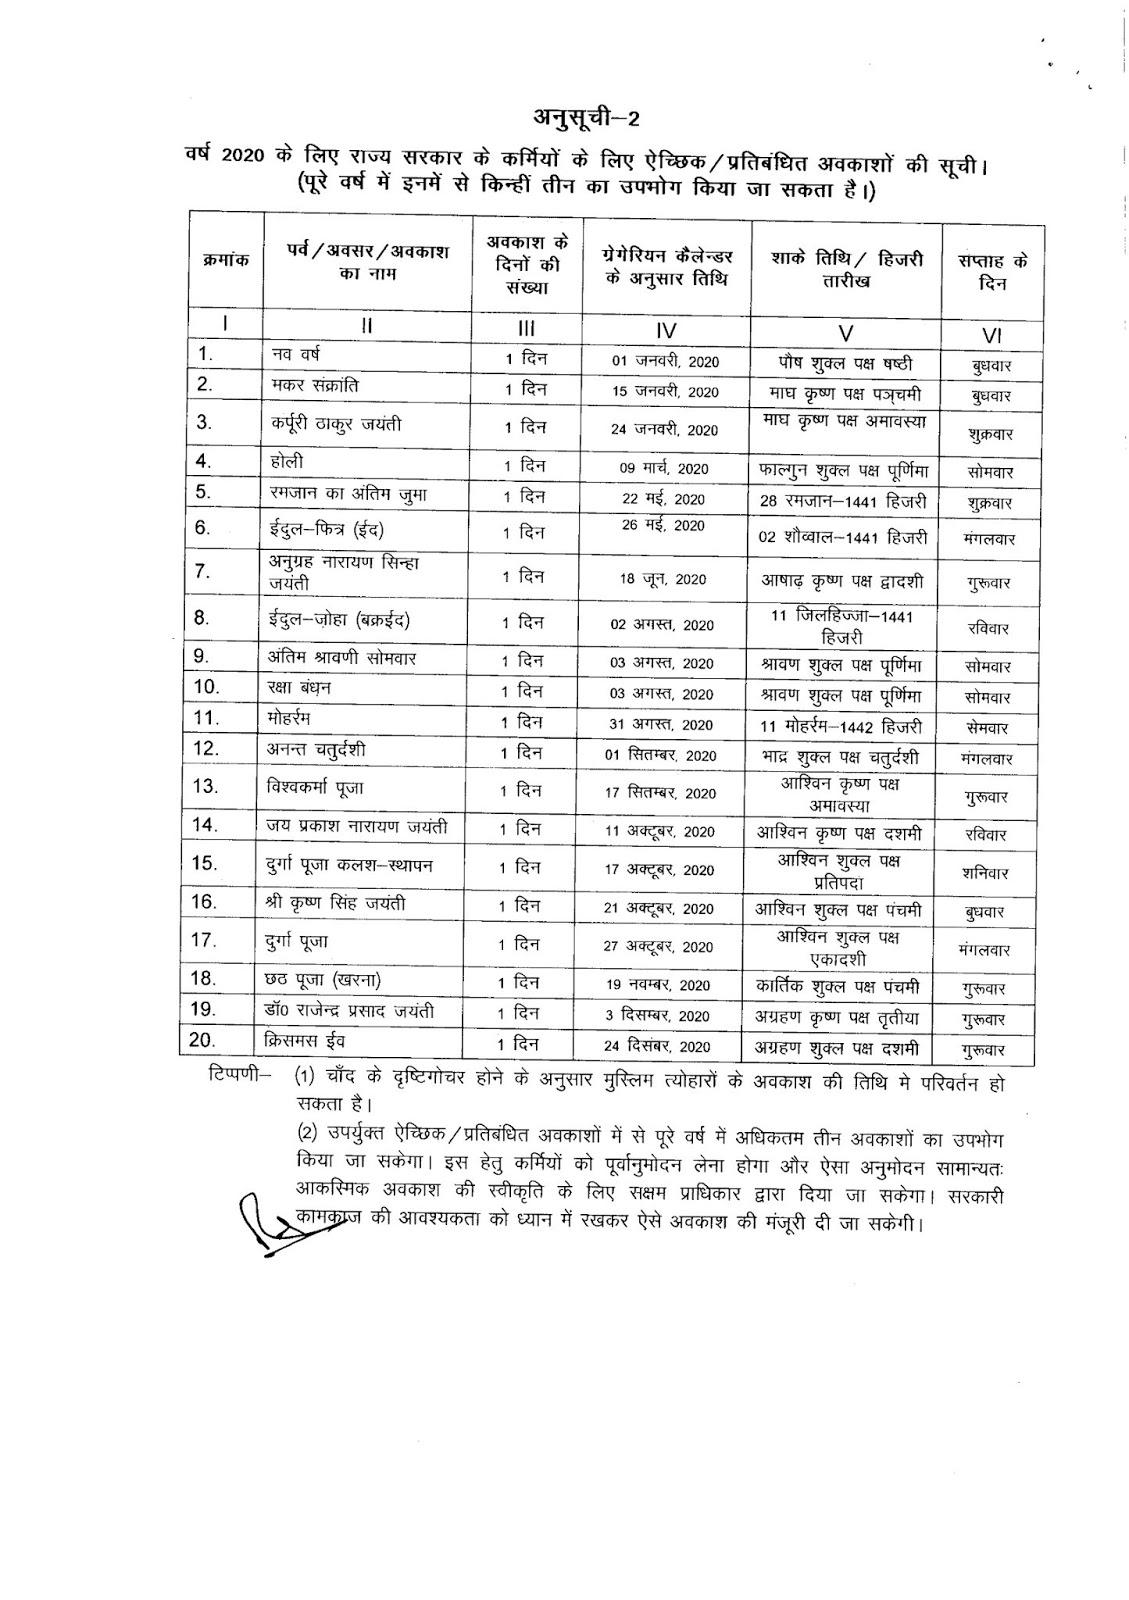 Bihar Government Calendar 2020 #educratsweb inside Bihar Govt Calendar 2020 Pdf